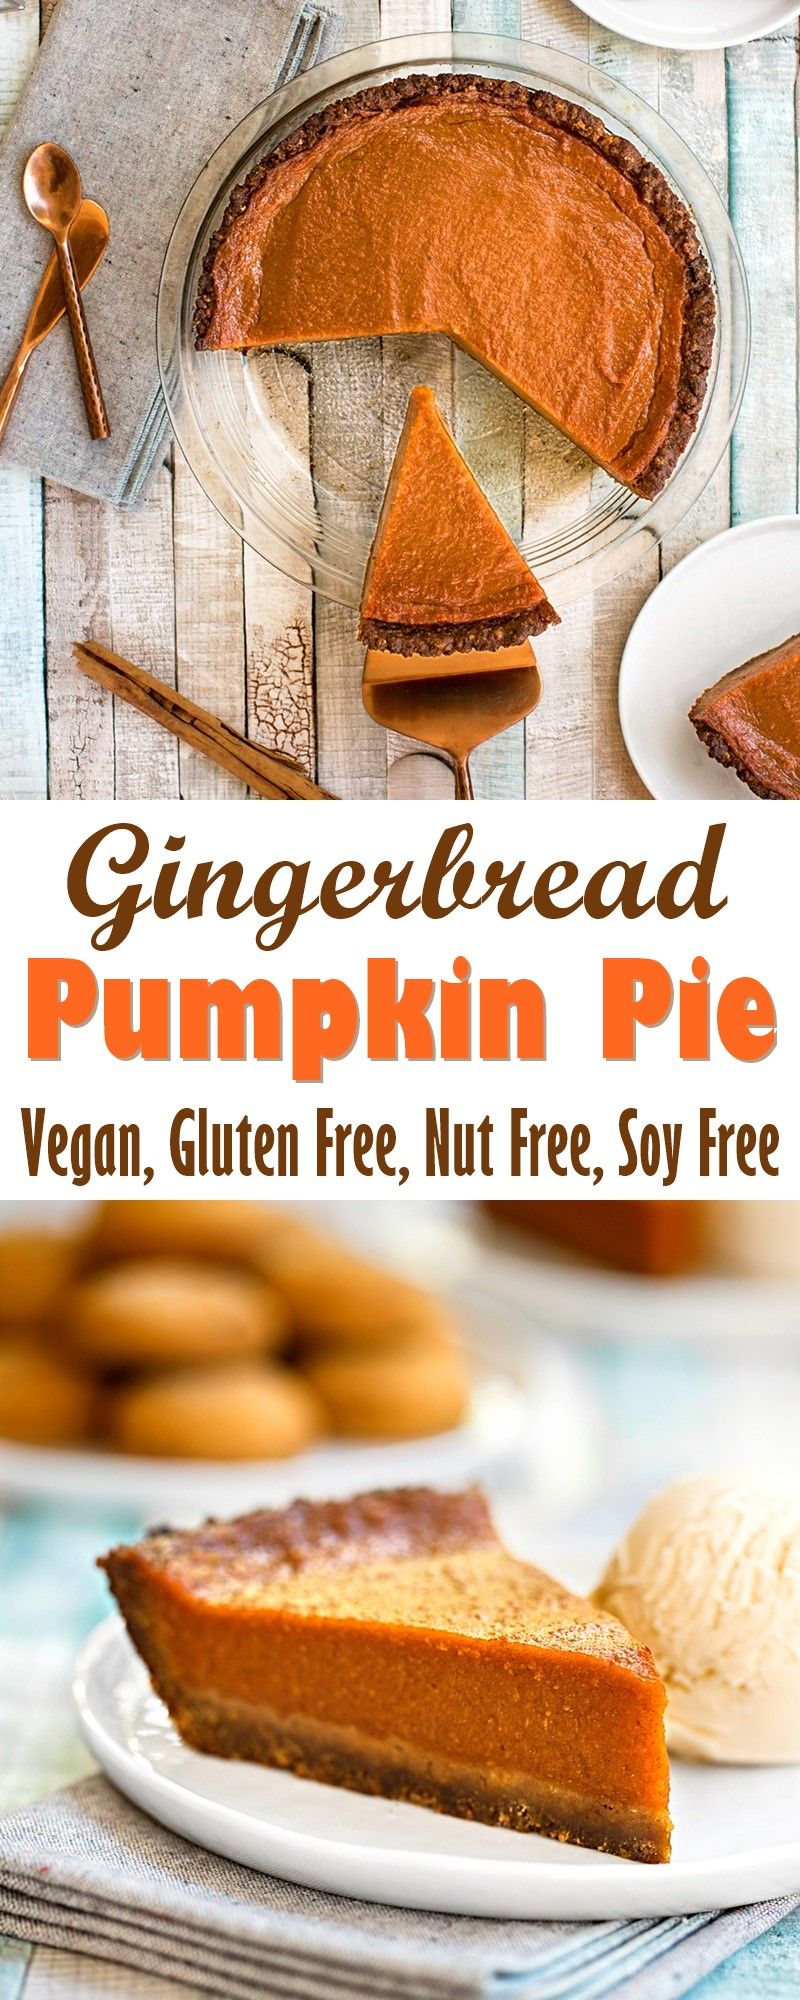 Gingerbread Pumpkin Pie Recipe Vegan Gluten Free Allergy Friendly Recipe Vegan Gingerbread Pumpkin Pie Recipes Vegan Pumpkin Pie Recipe